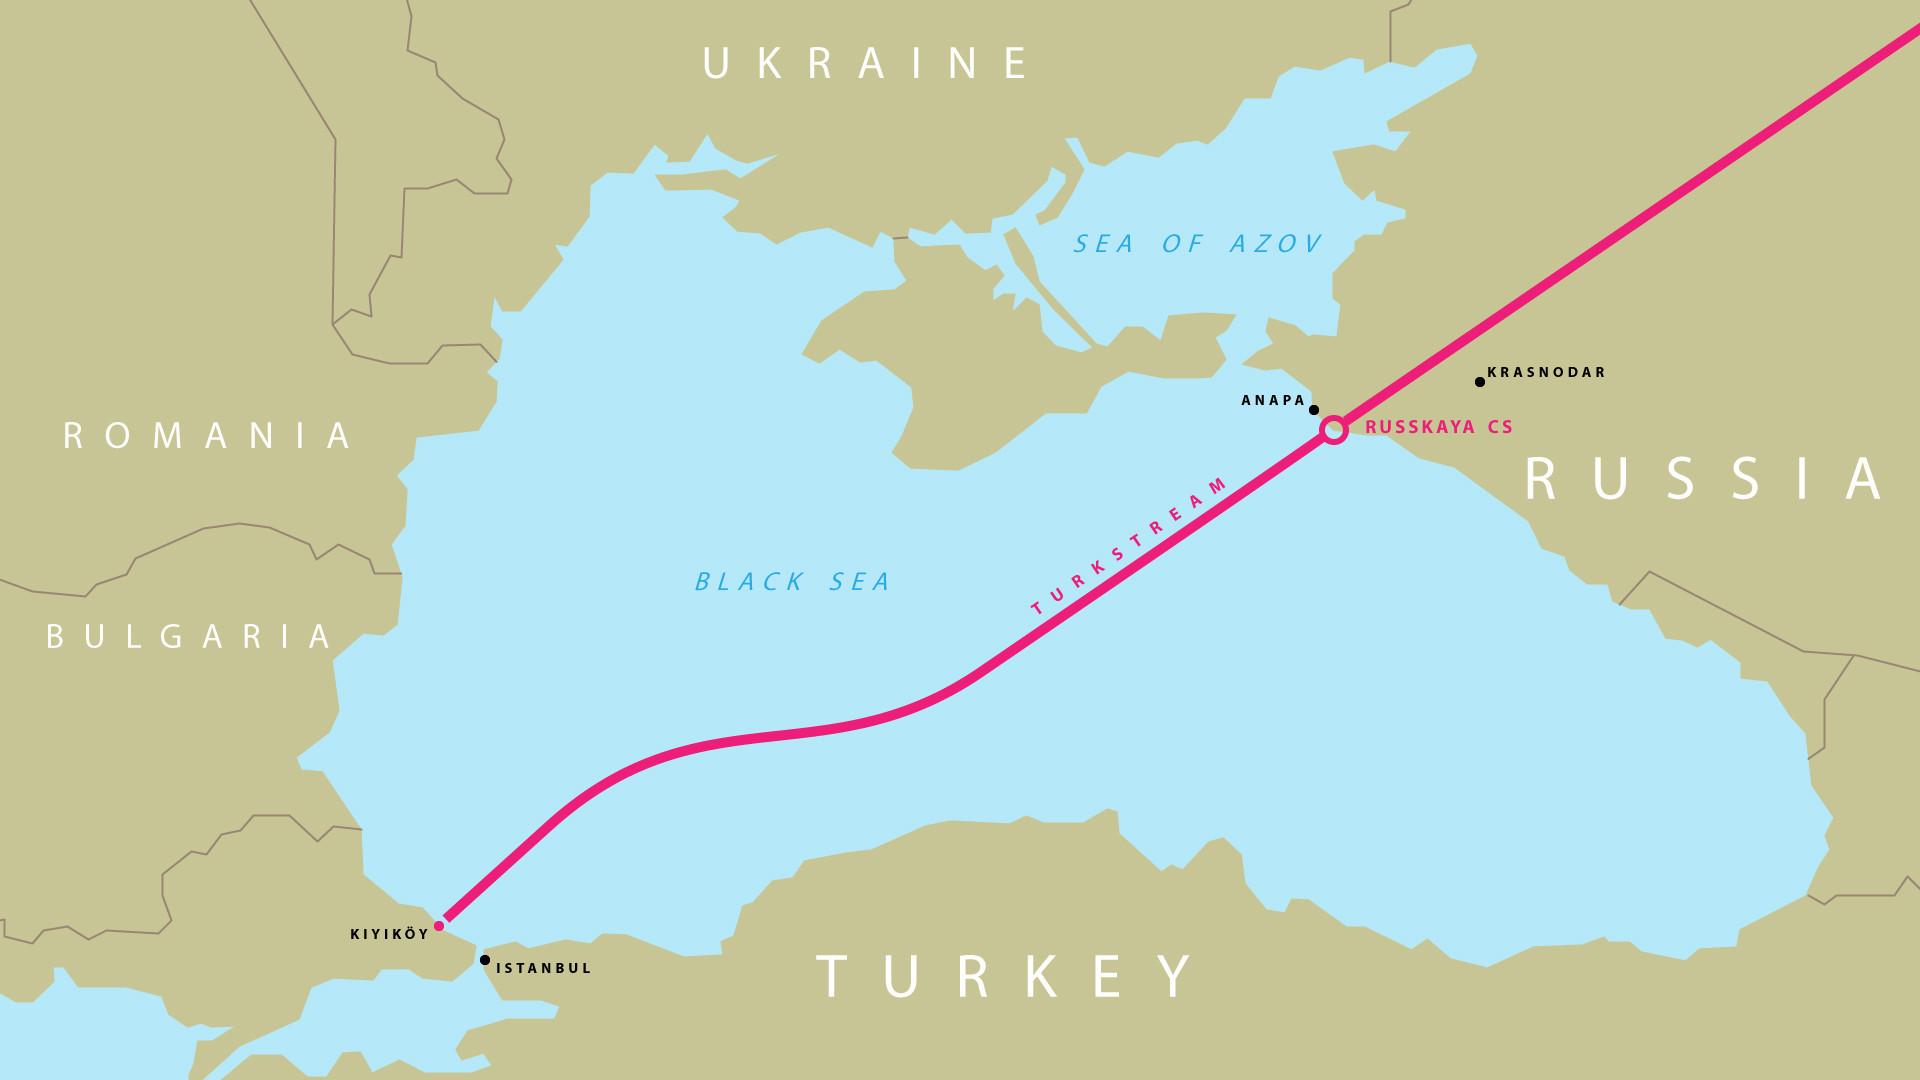 Sumber: Gazprom